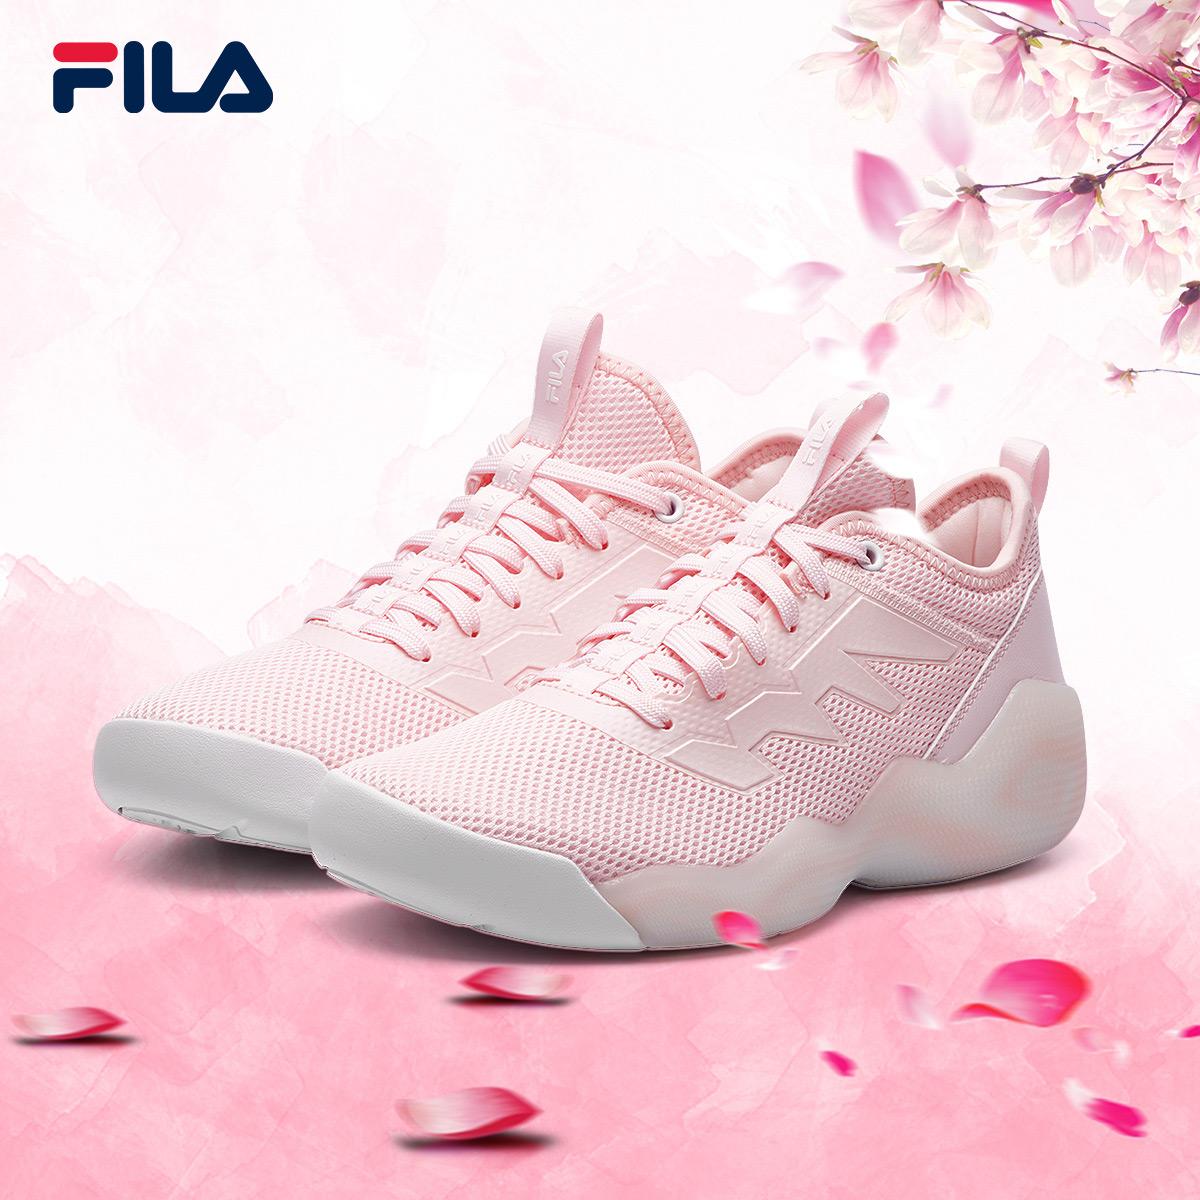 FILA斐乐女鞋BB鞋2018夏季新款经典运动休闲潮范篮球鞋女